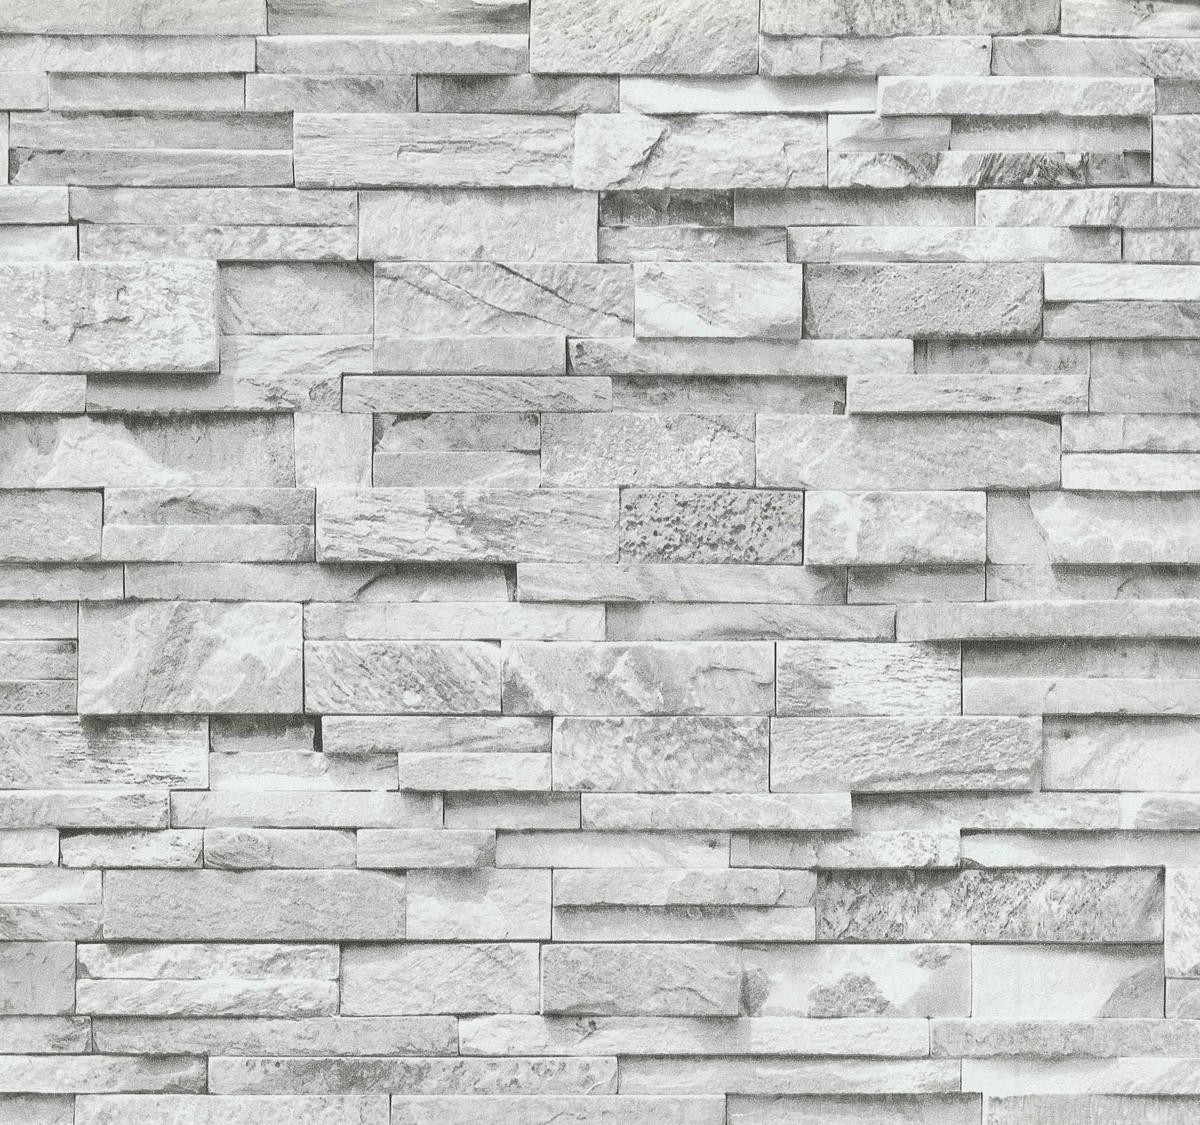 vliestapete grau steine mauer ps 02363 30. Black Bedroom Furniture Sets. Home Design Ideas